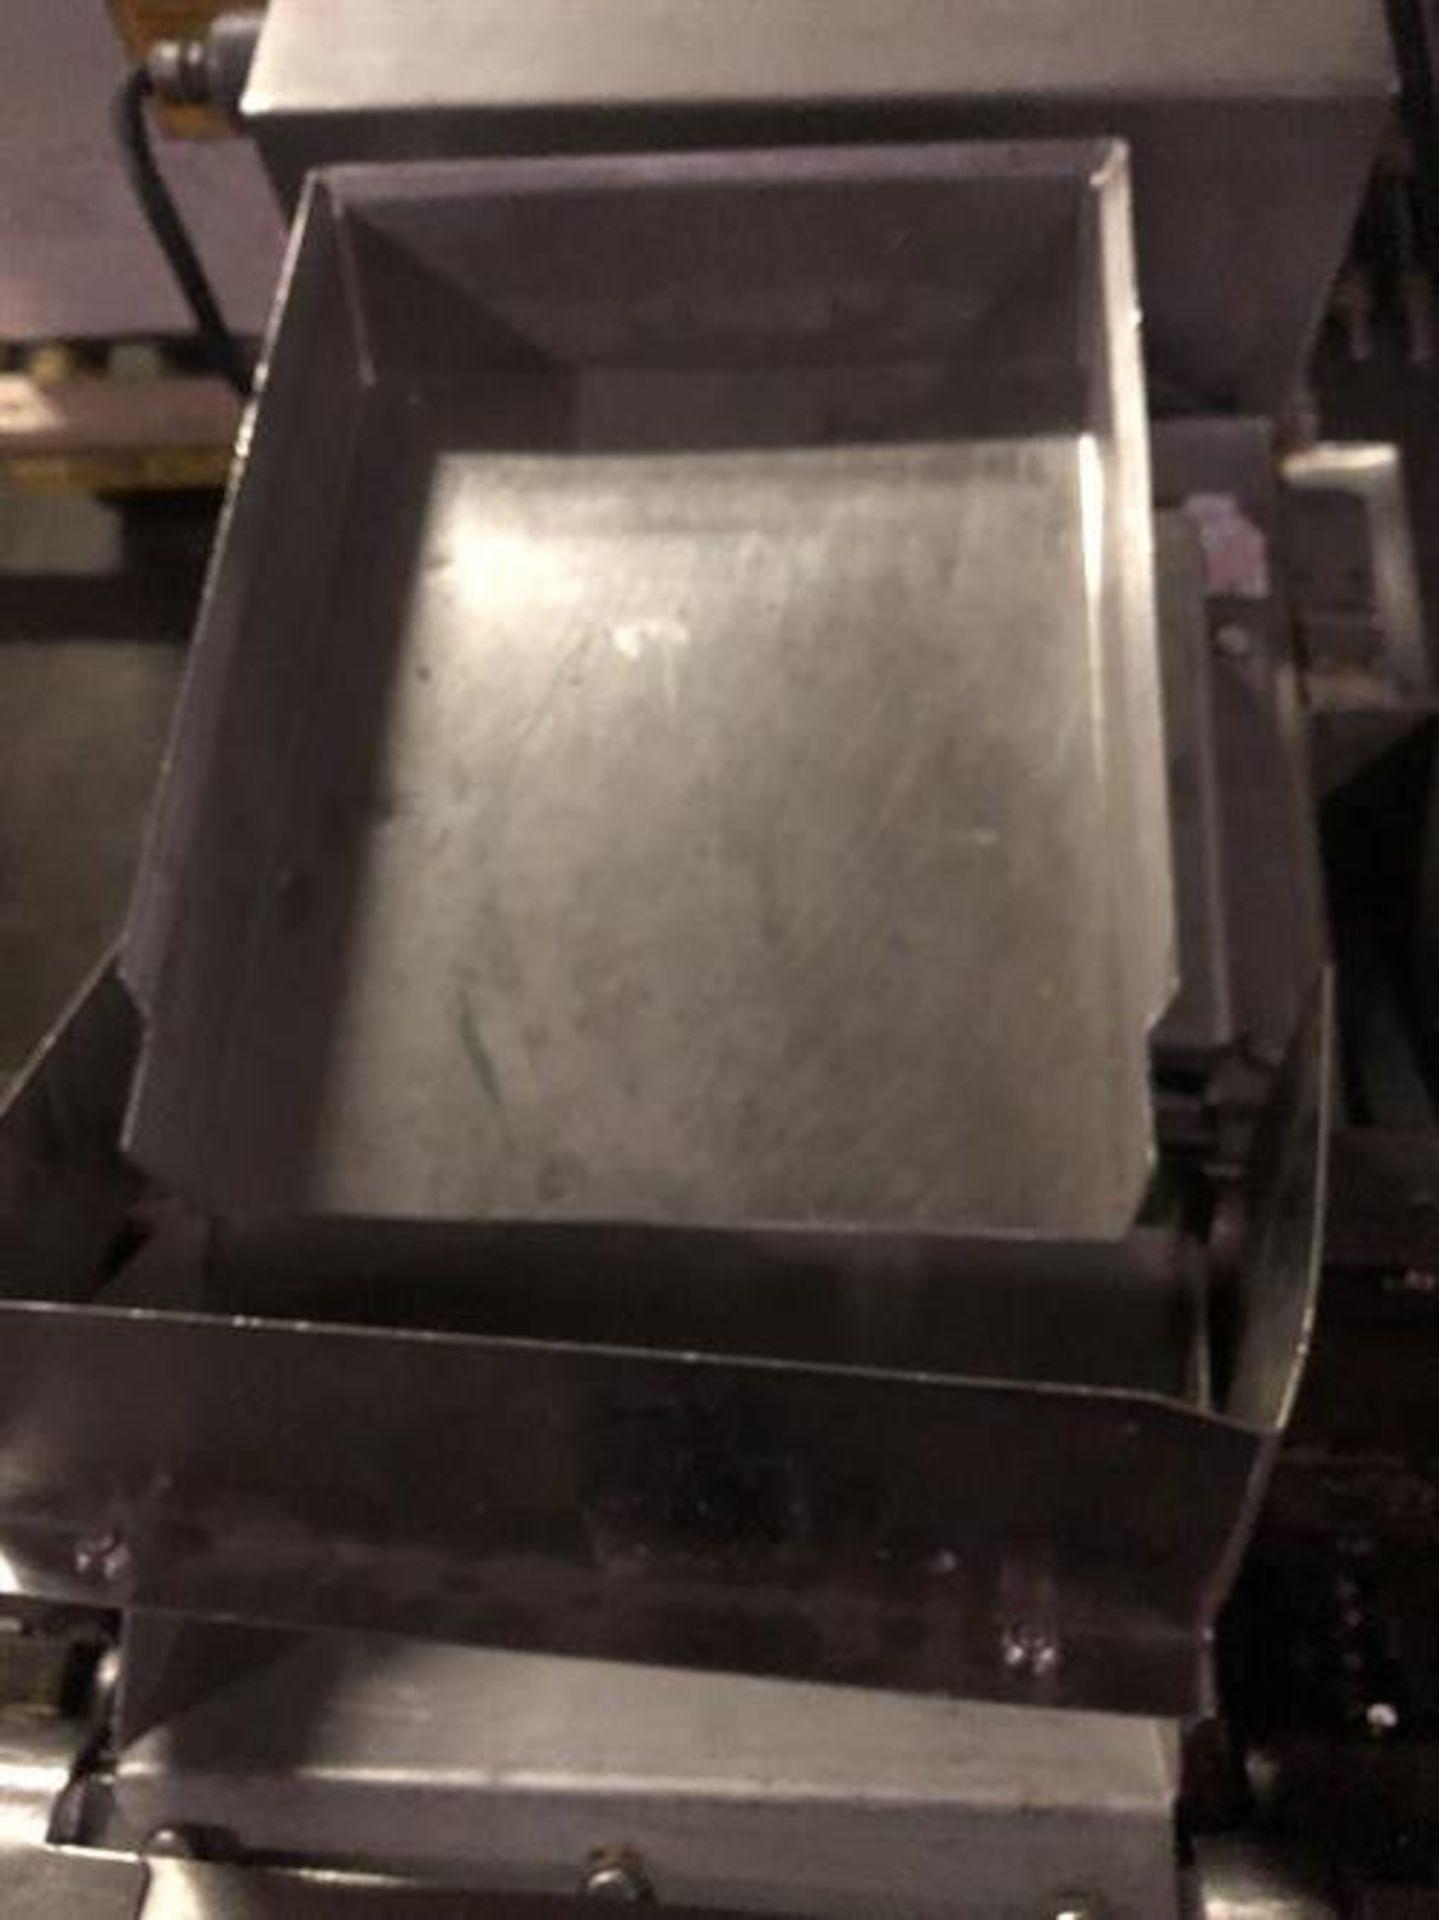 Urschel model N Stainless Steel Granulator - Vibrator pan feeder with variable speed rheostat - - Image 8 of 18